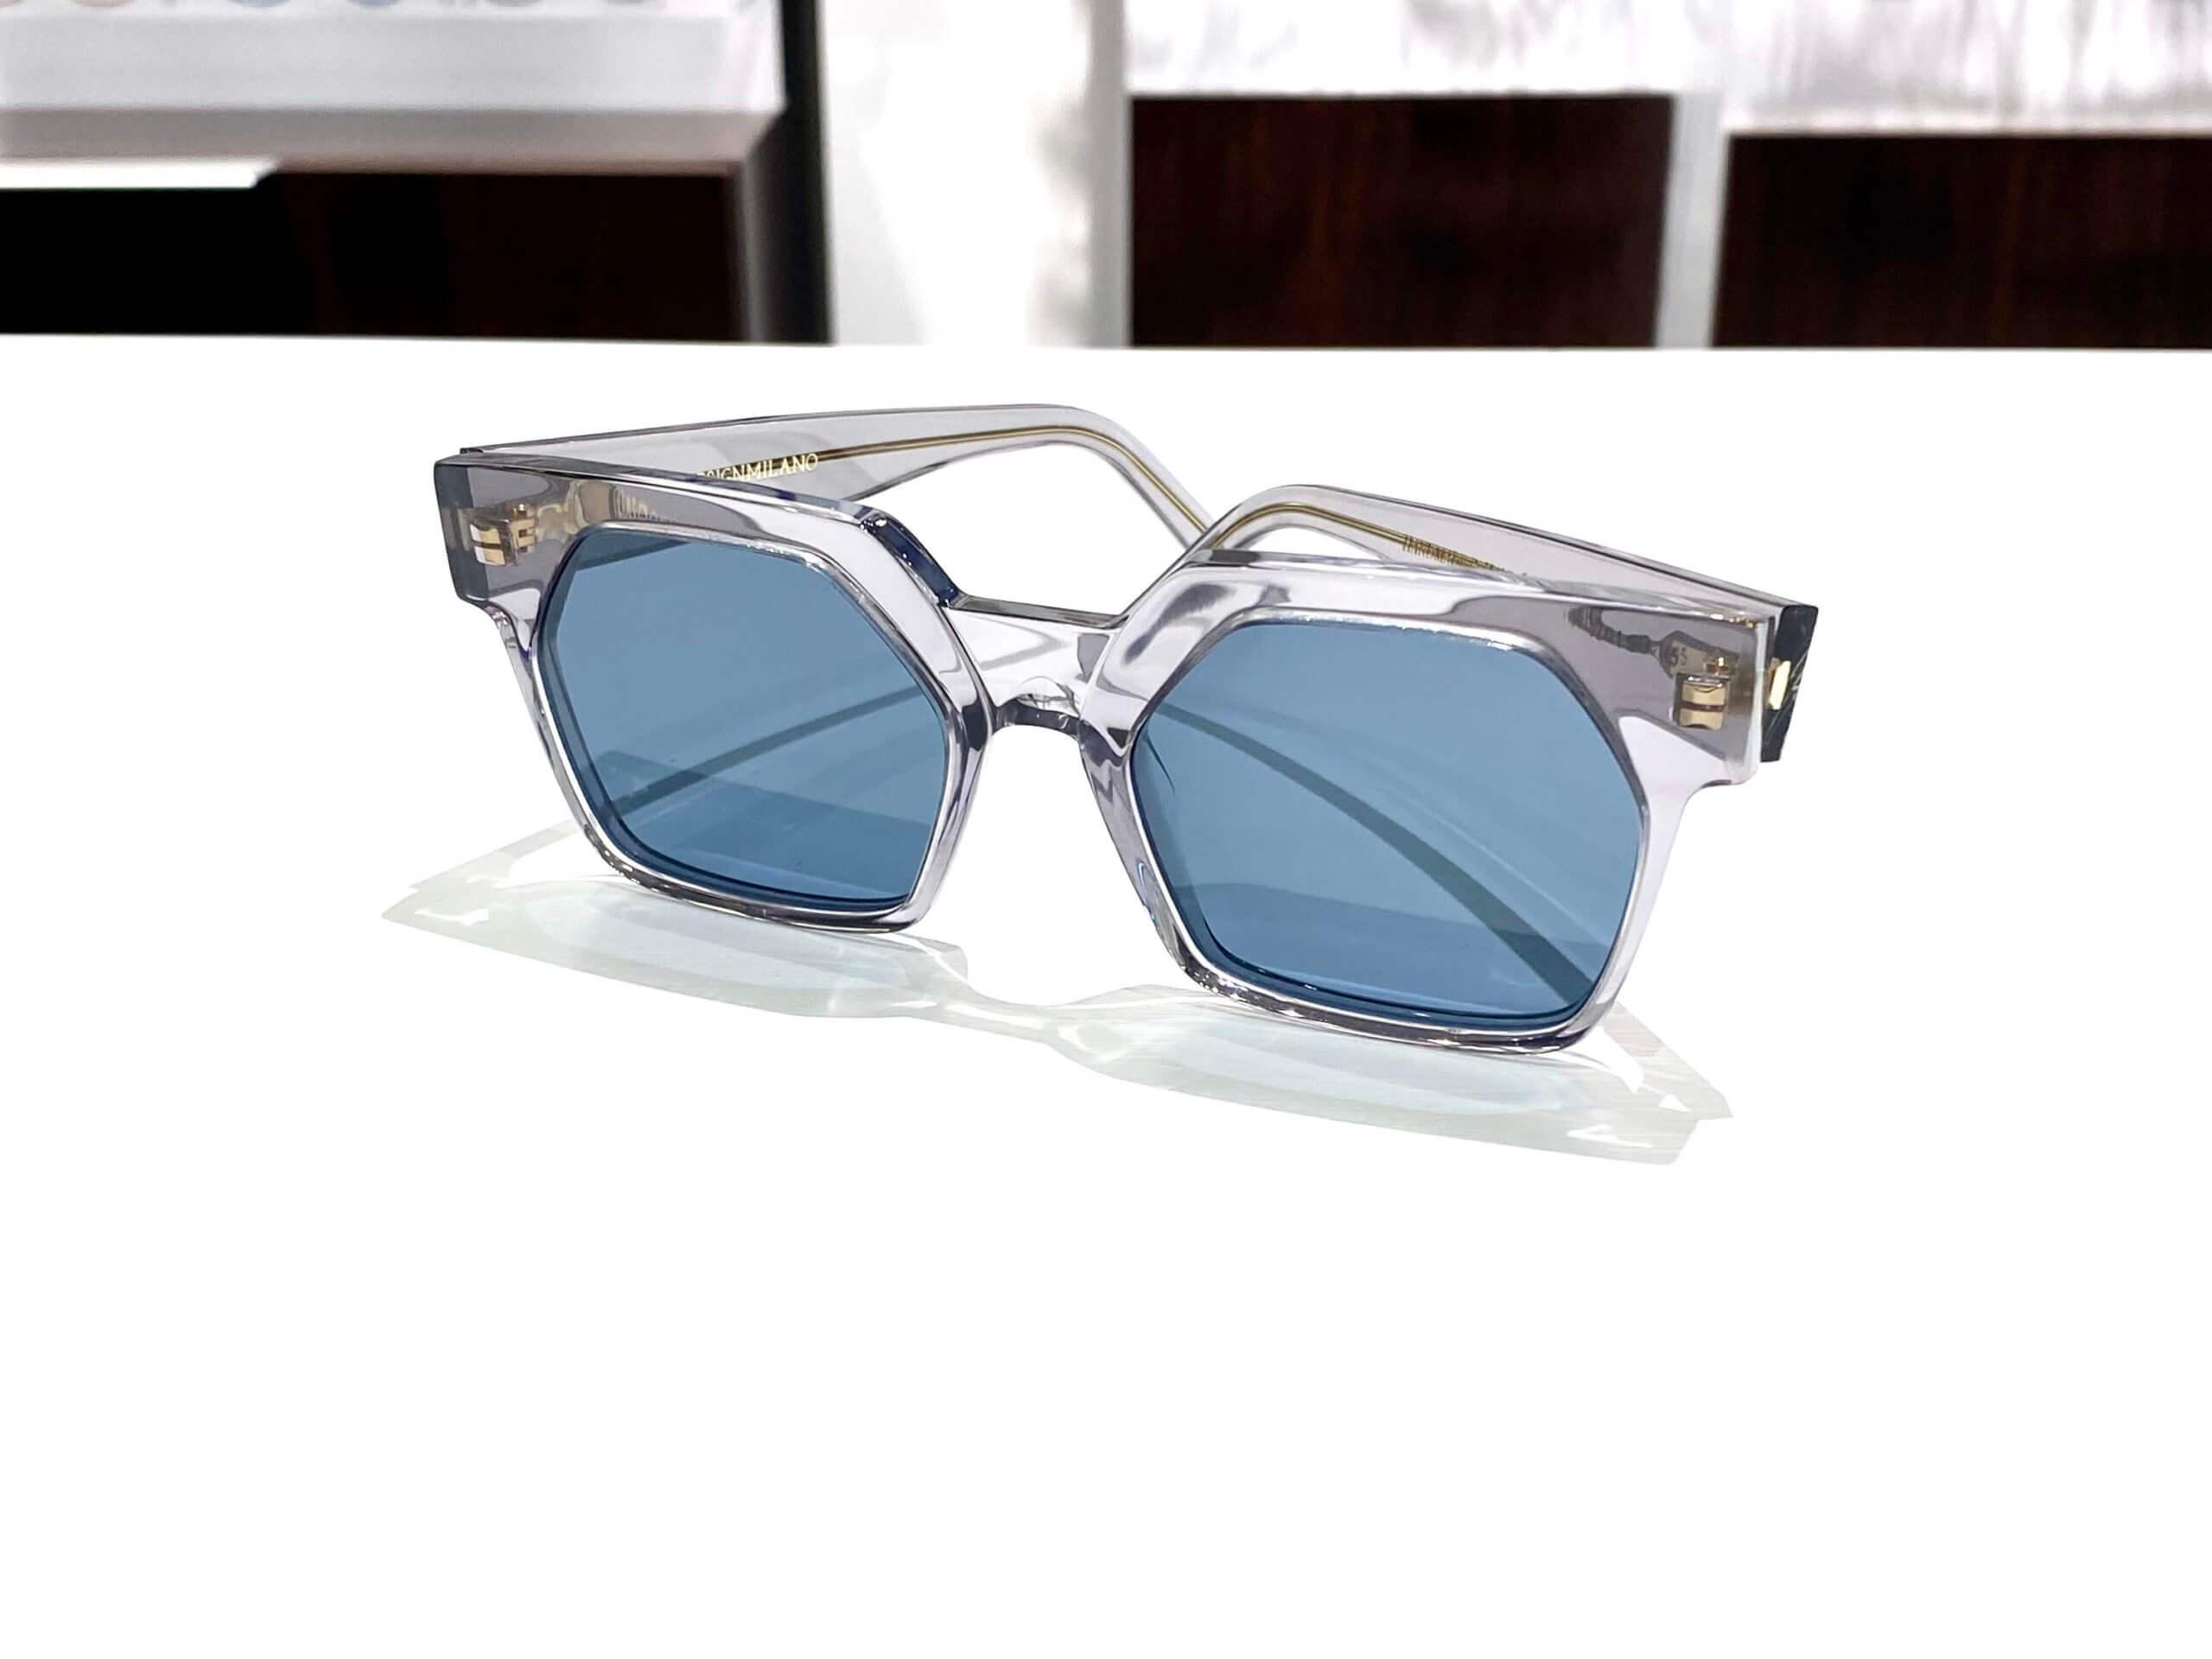 sunglassespic2-scaled